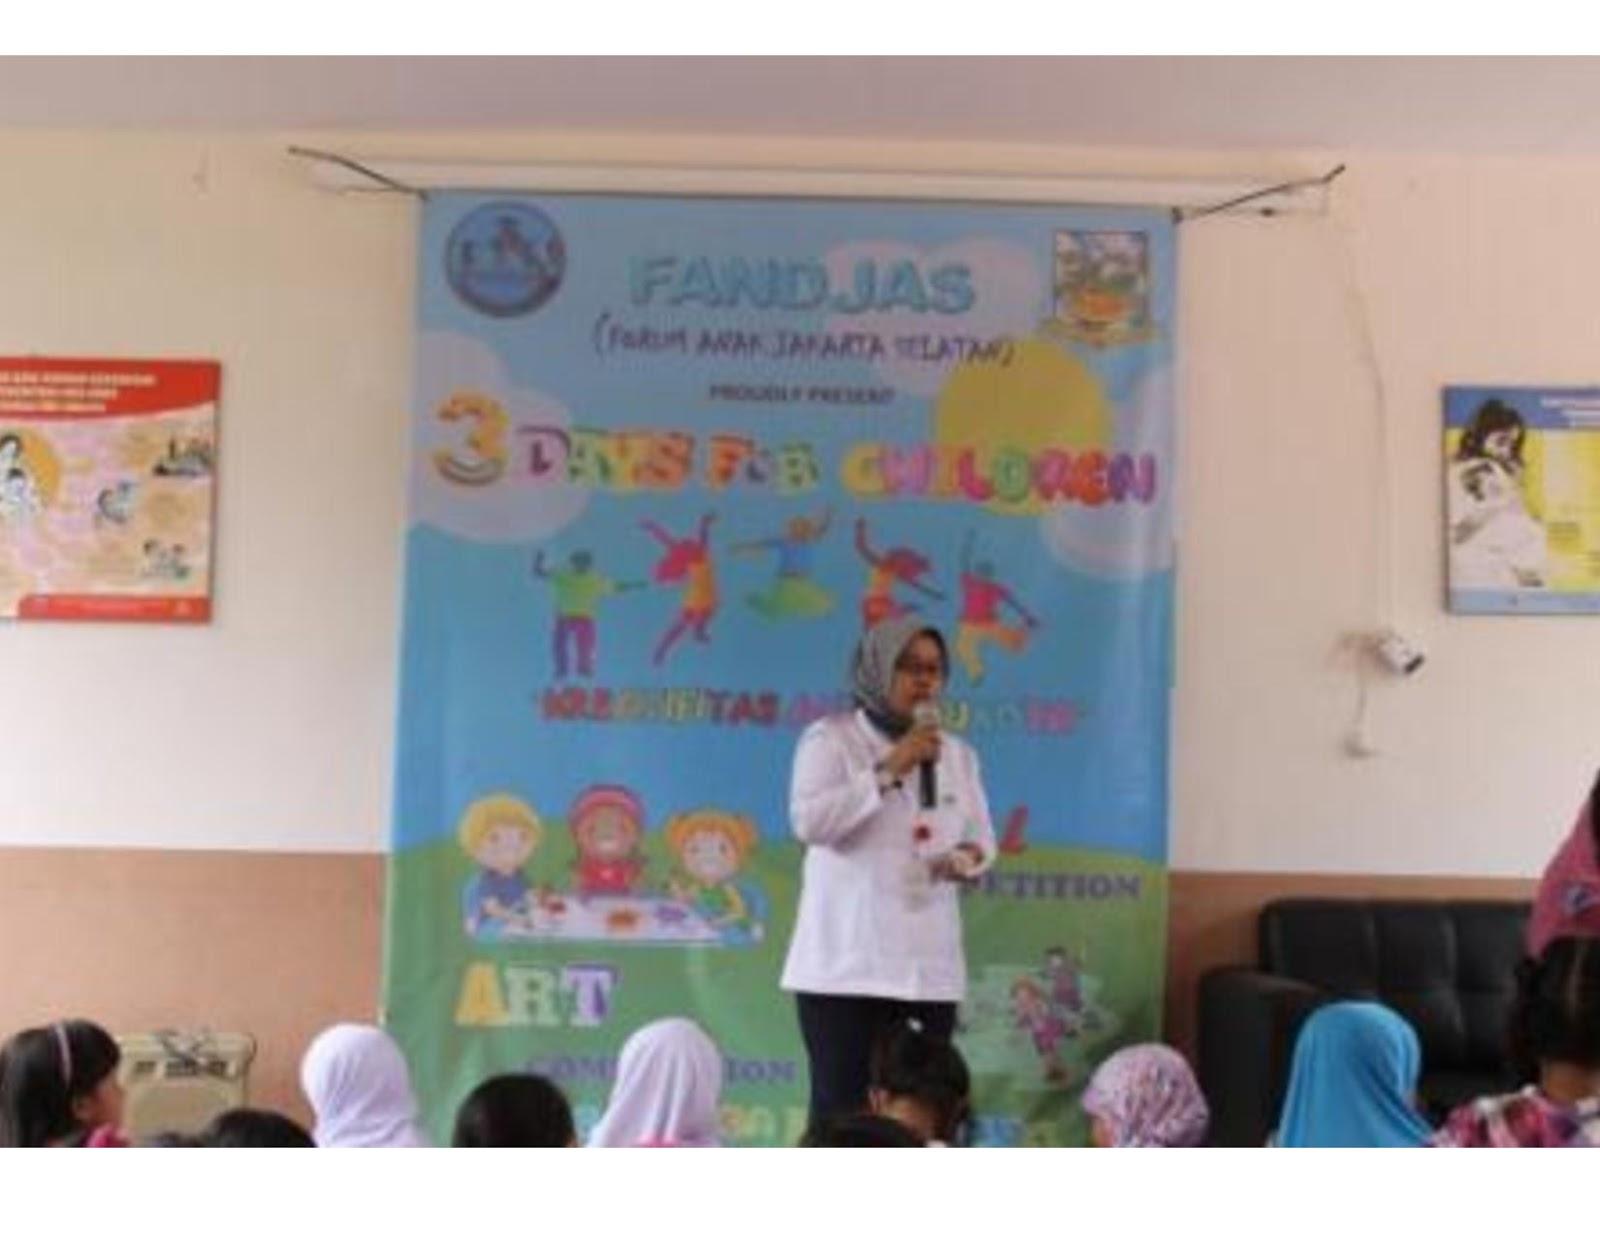 Forum Anak Daerah Jakarta Selatan FANDJAS